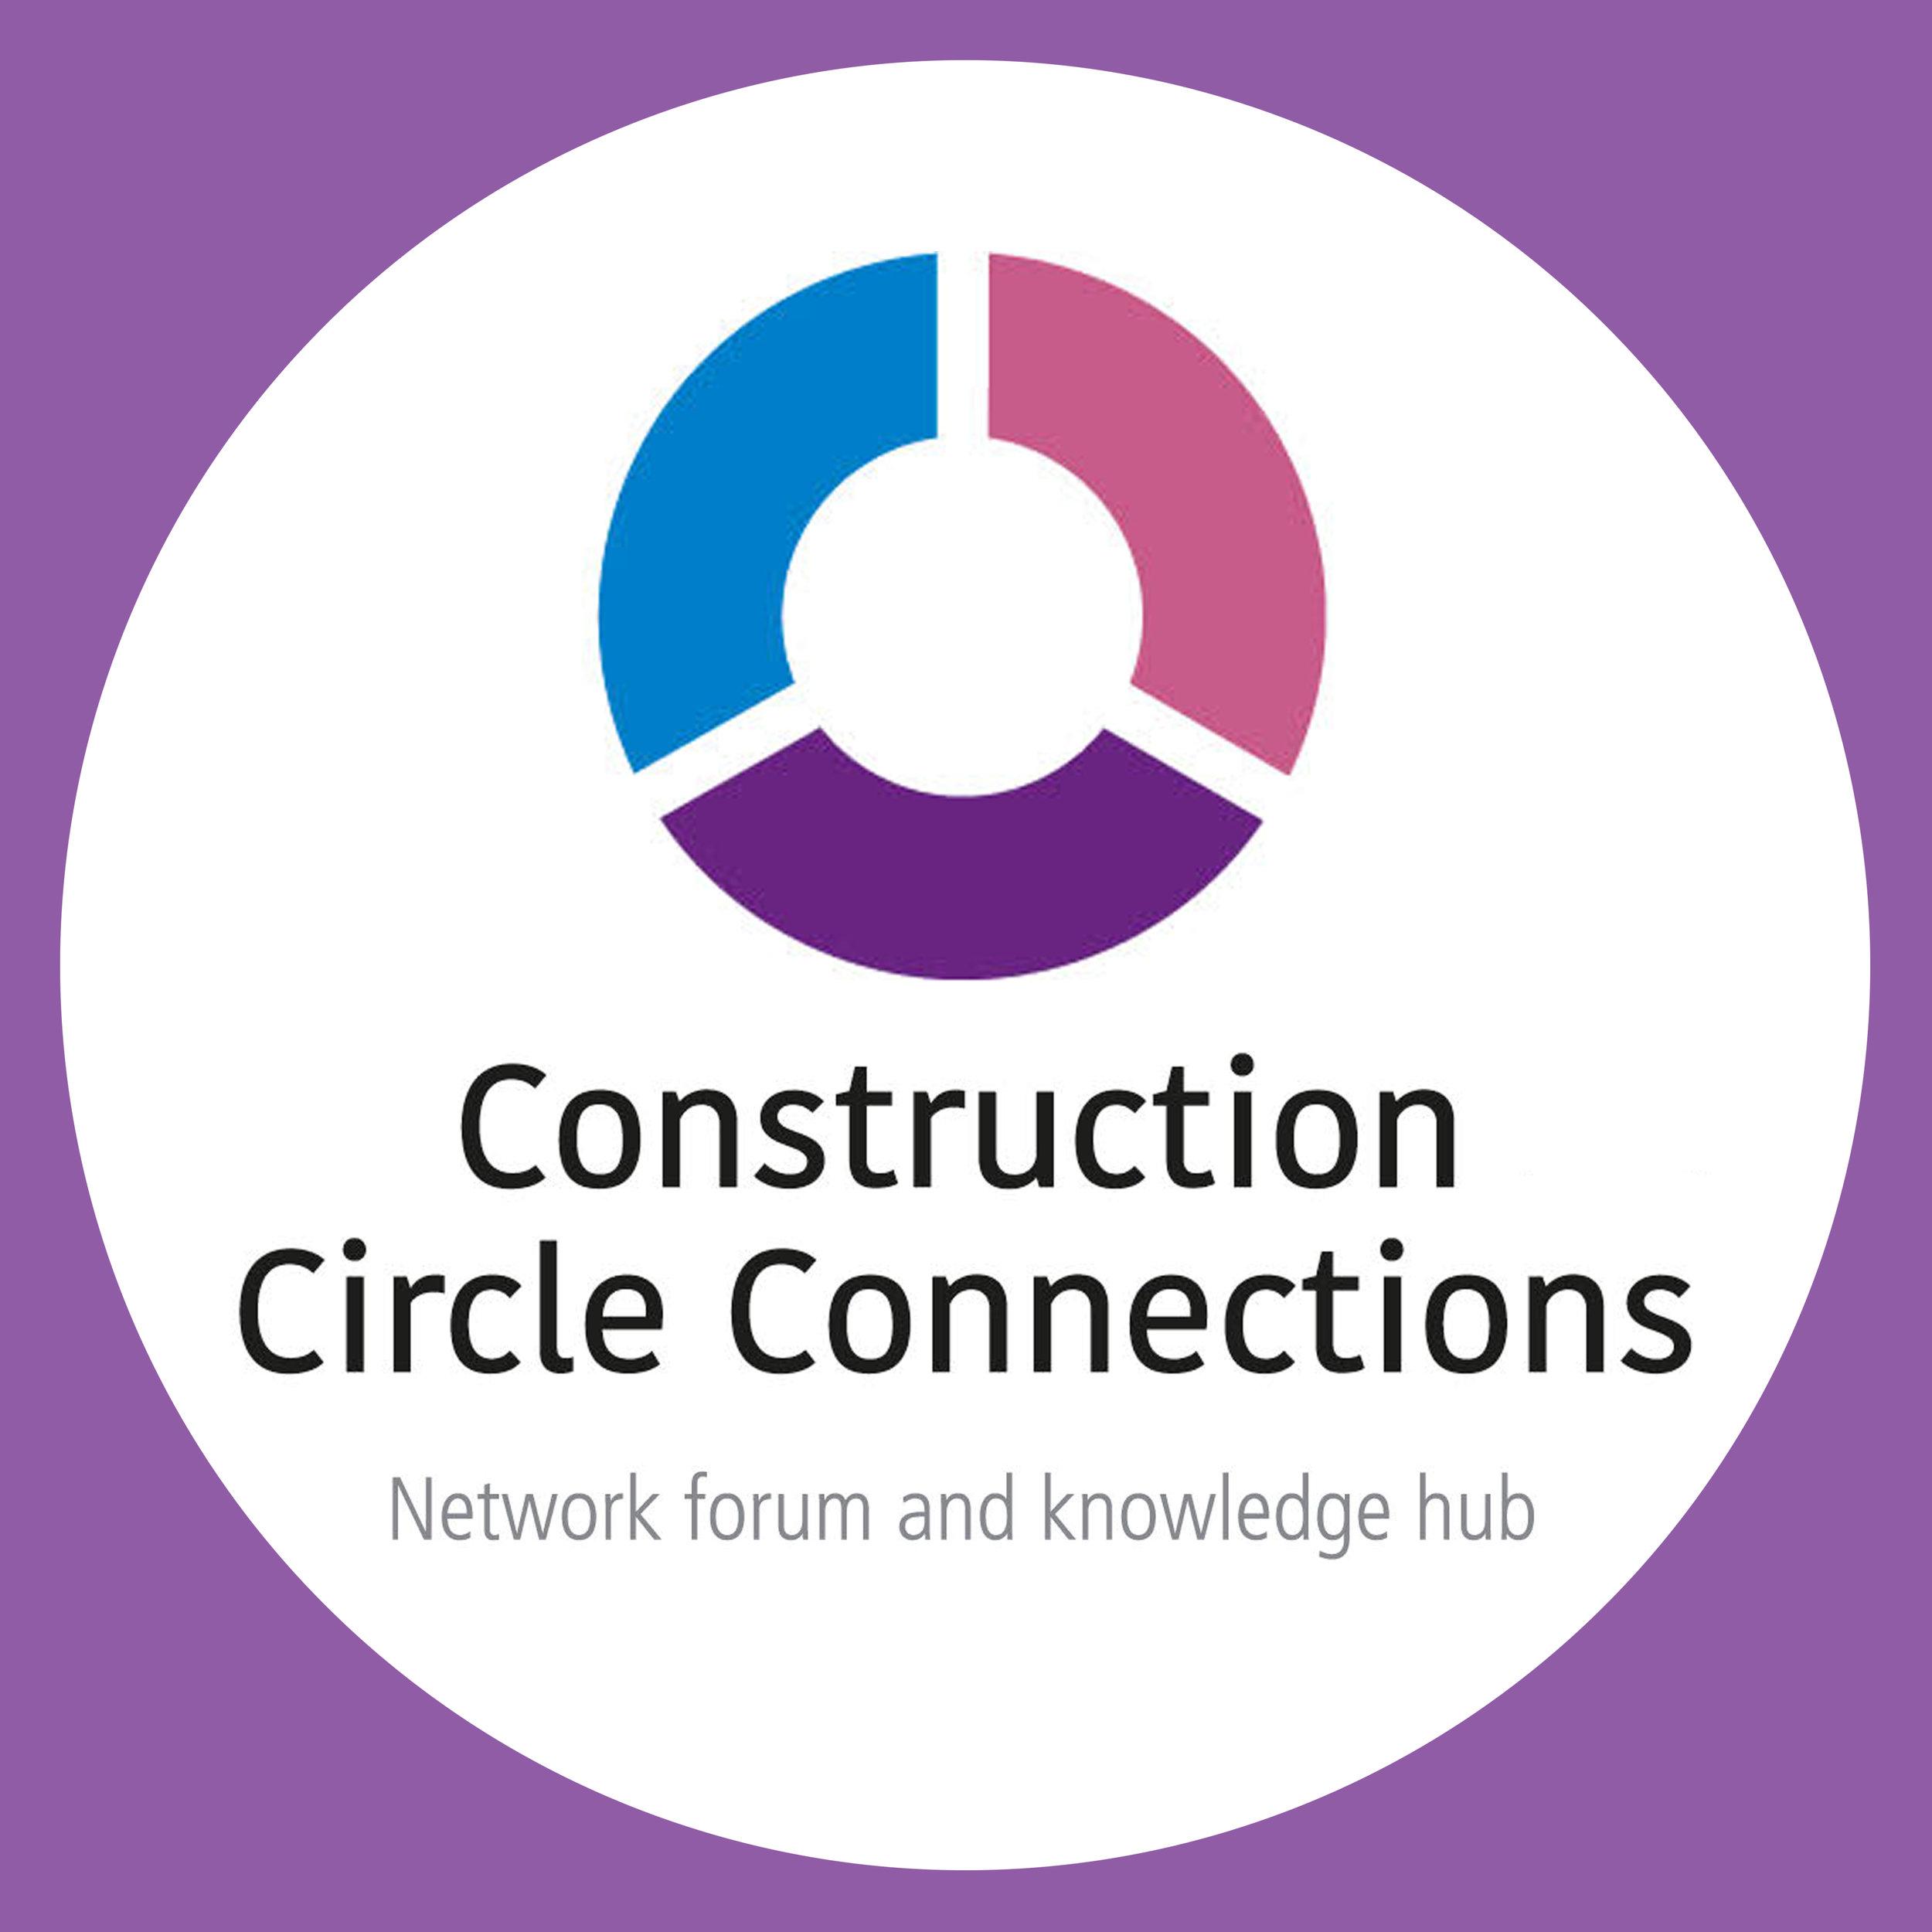 Construction Circle Connections logo in circle_v1_RGB.jpg